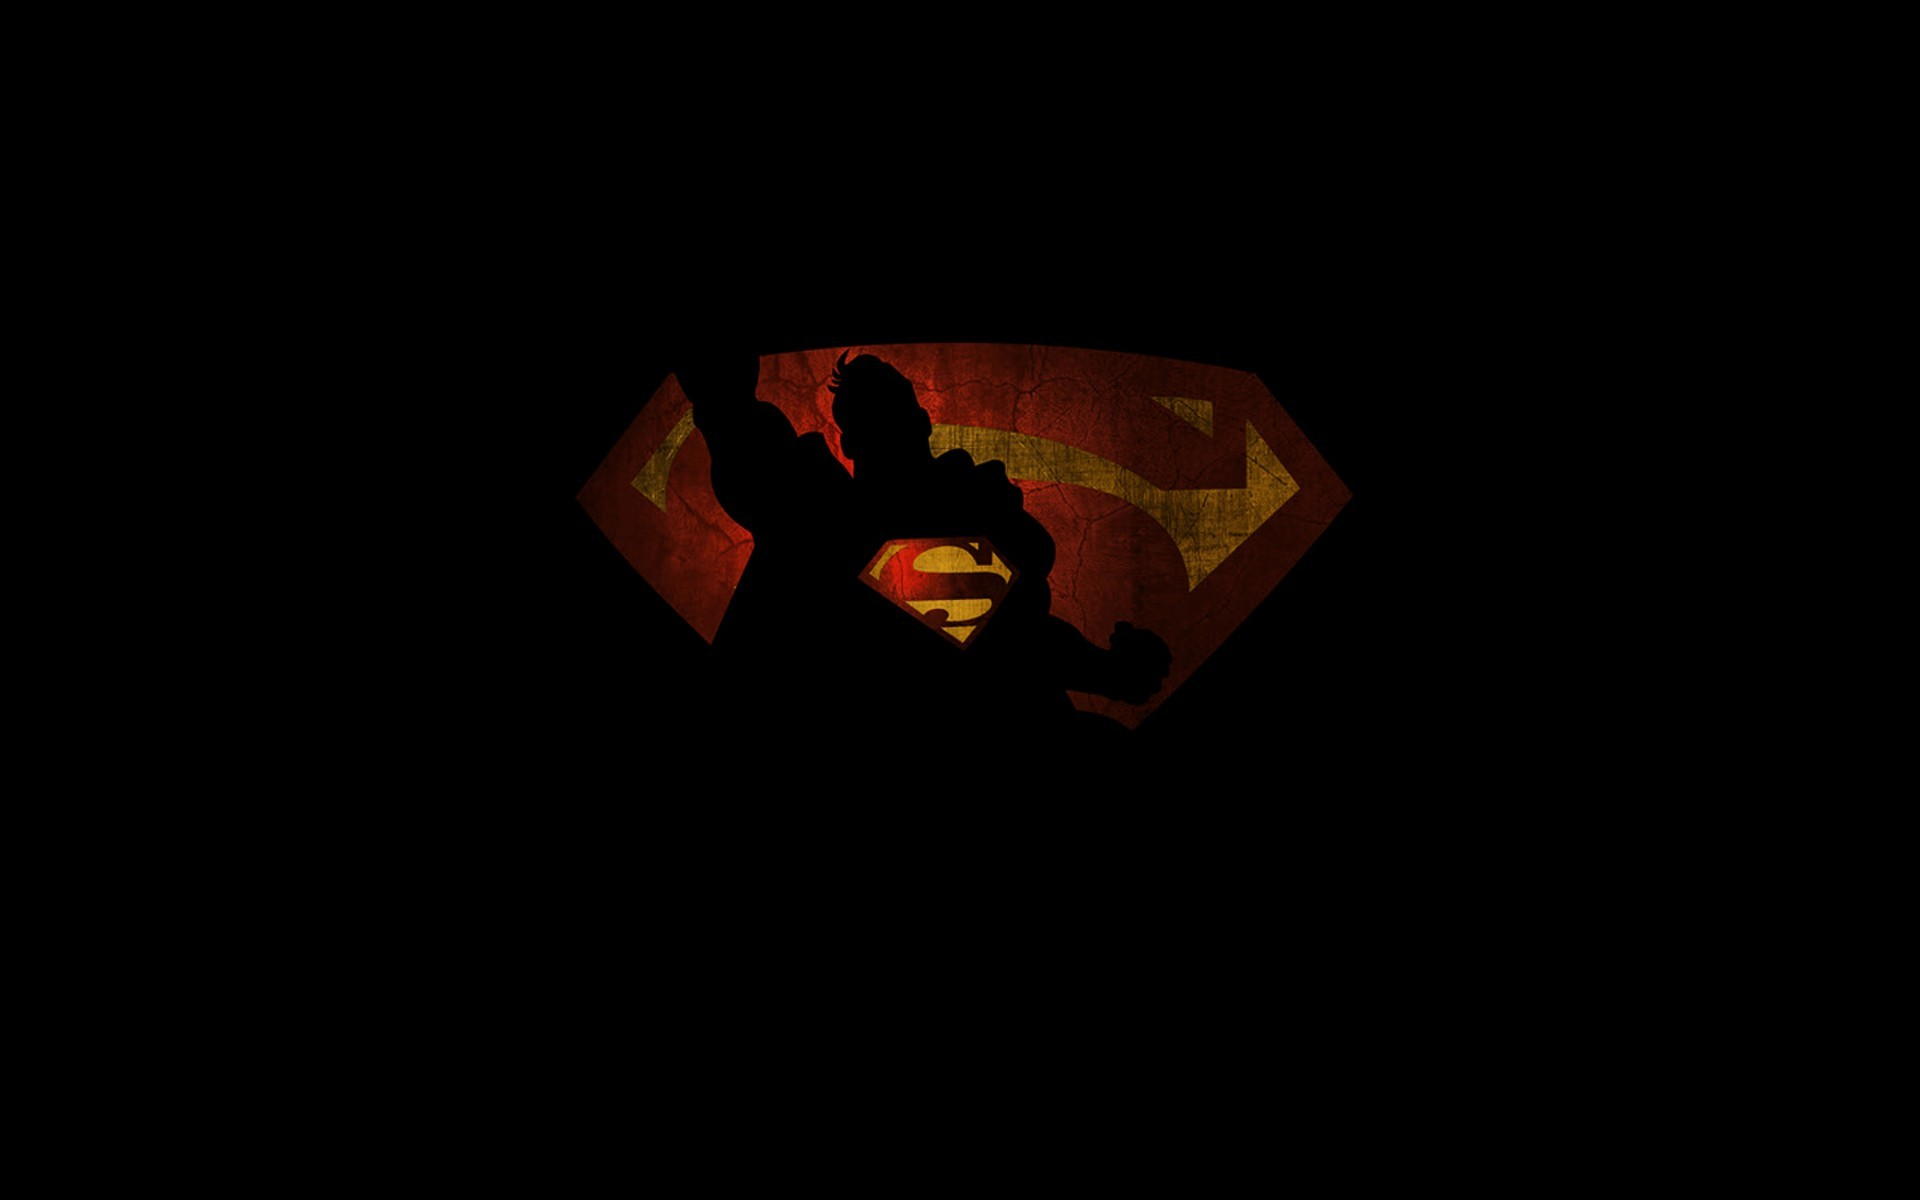 black superman logo wallpaper 68 images